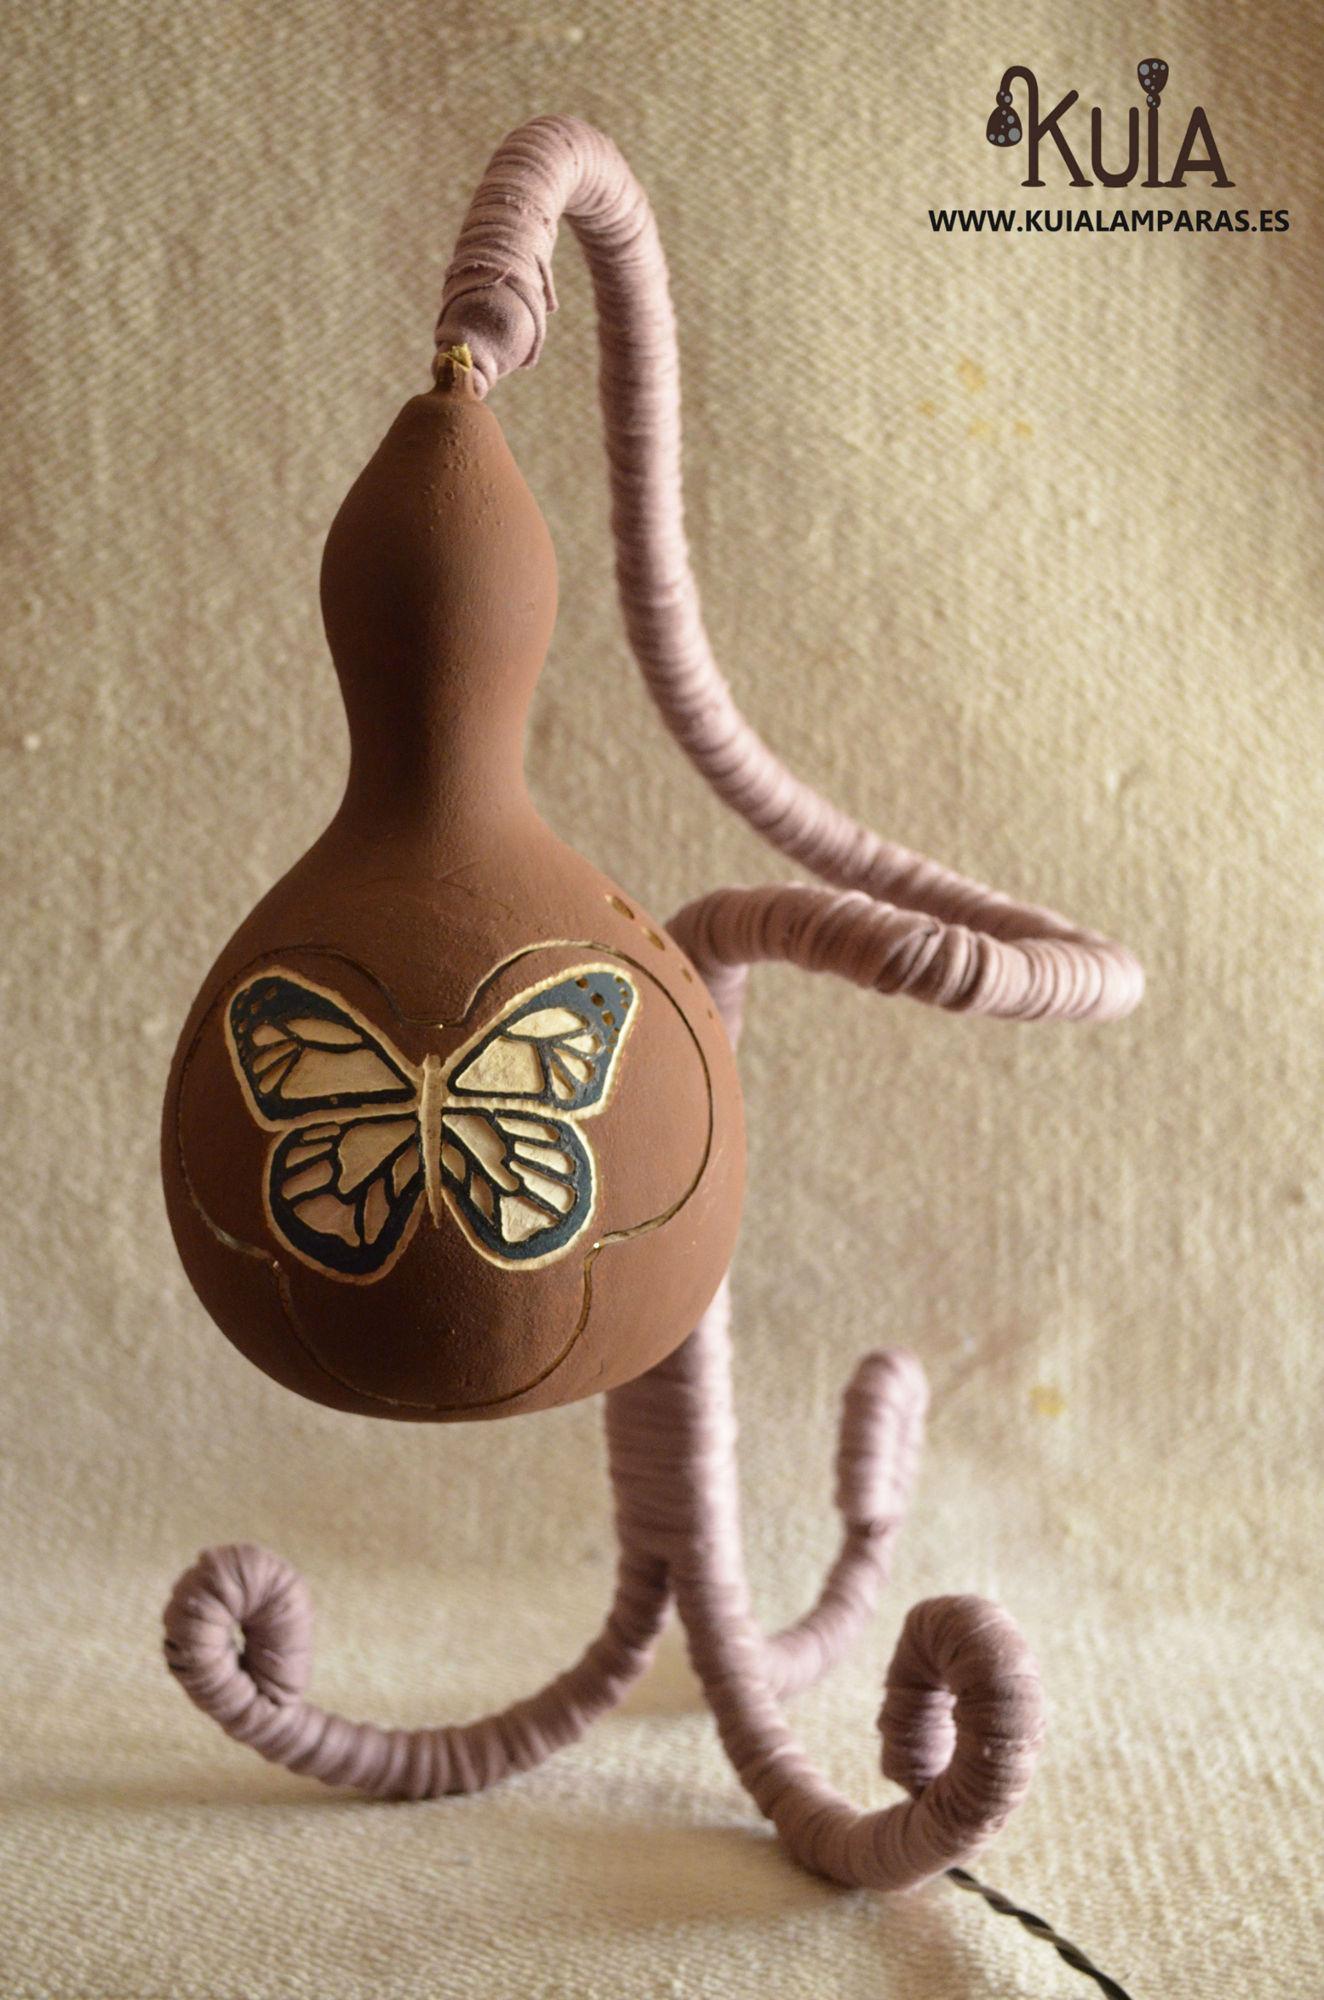 lampara artesana ecologica pinpilinpauxa